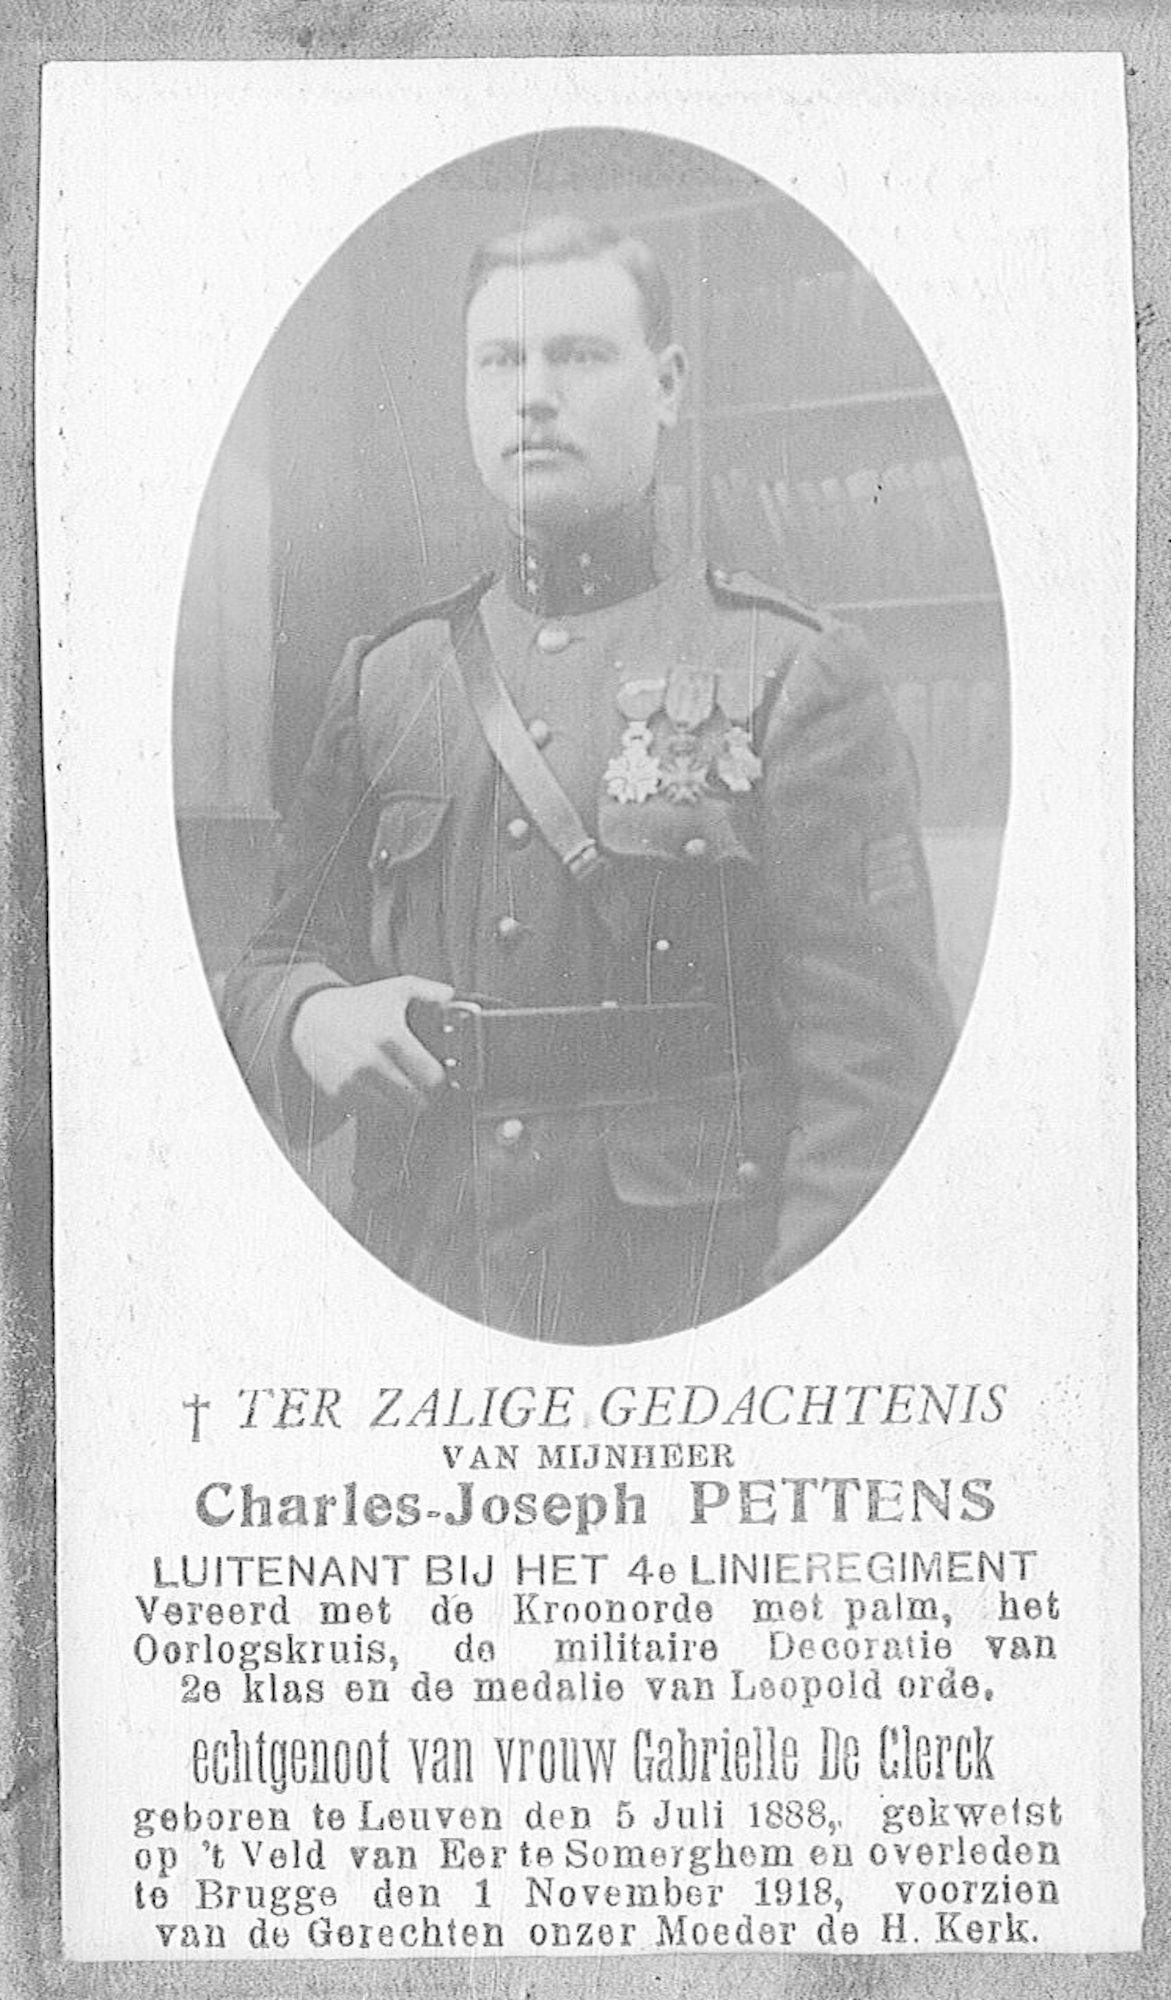 Pettens Charles-Joseph